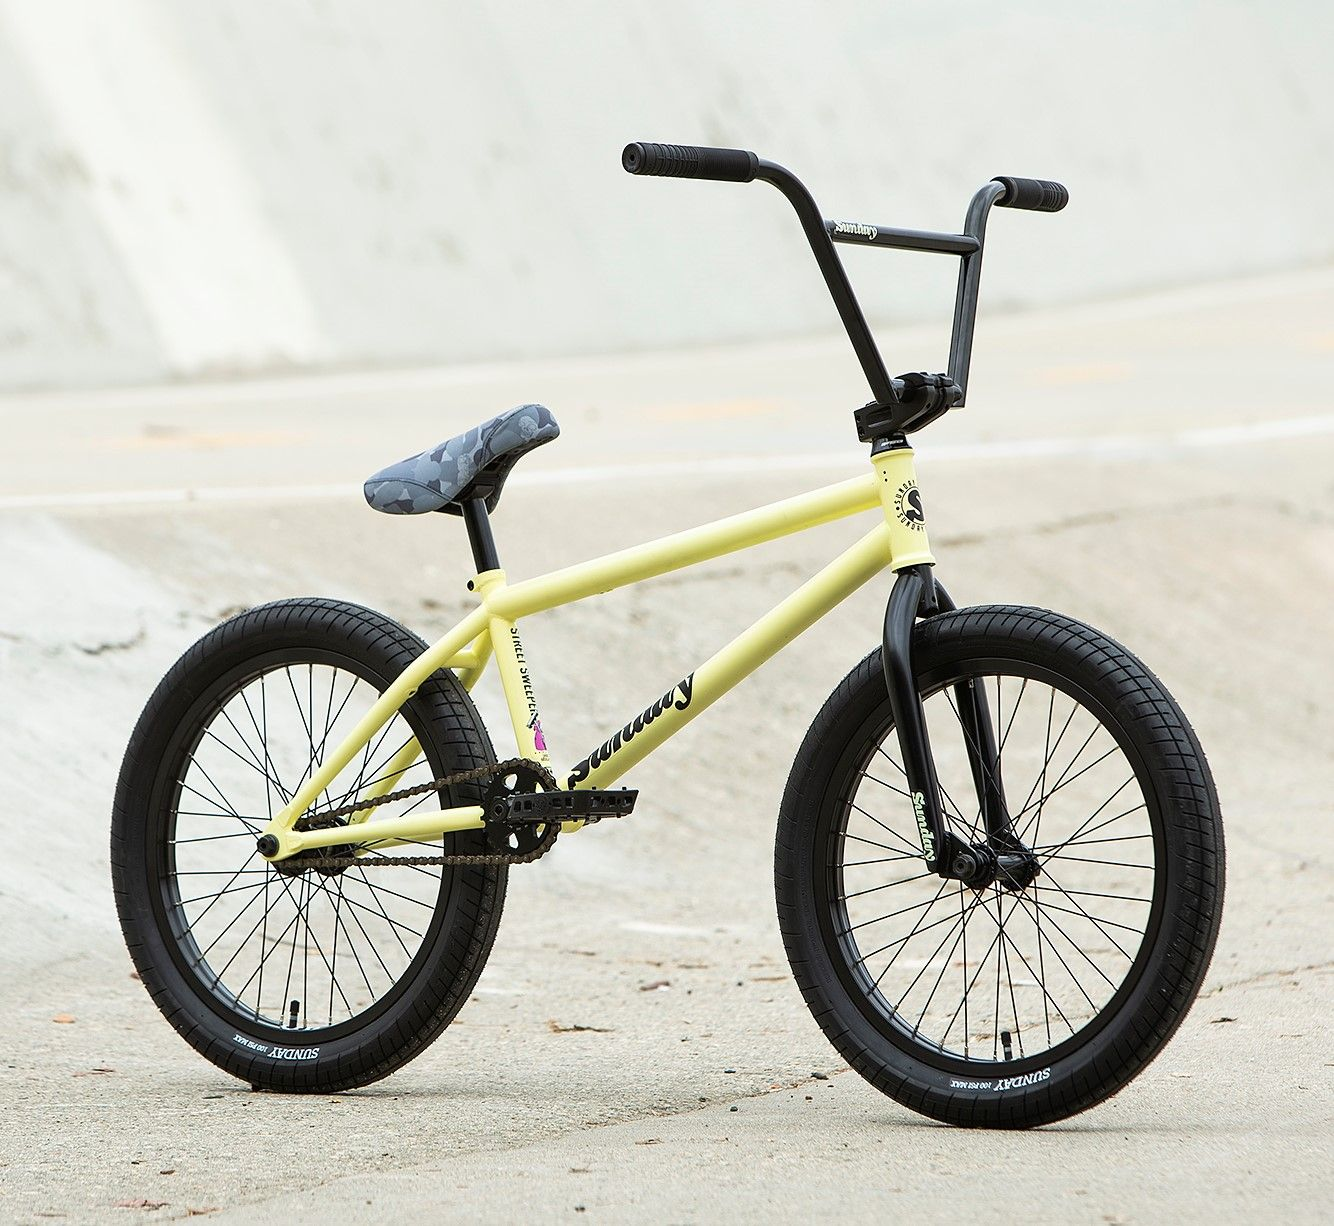 Details about 2020 SUNDAY BIKE BMX STREET SWEEPER 20 ...